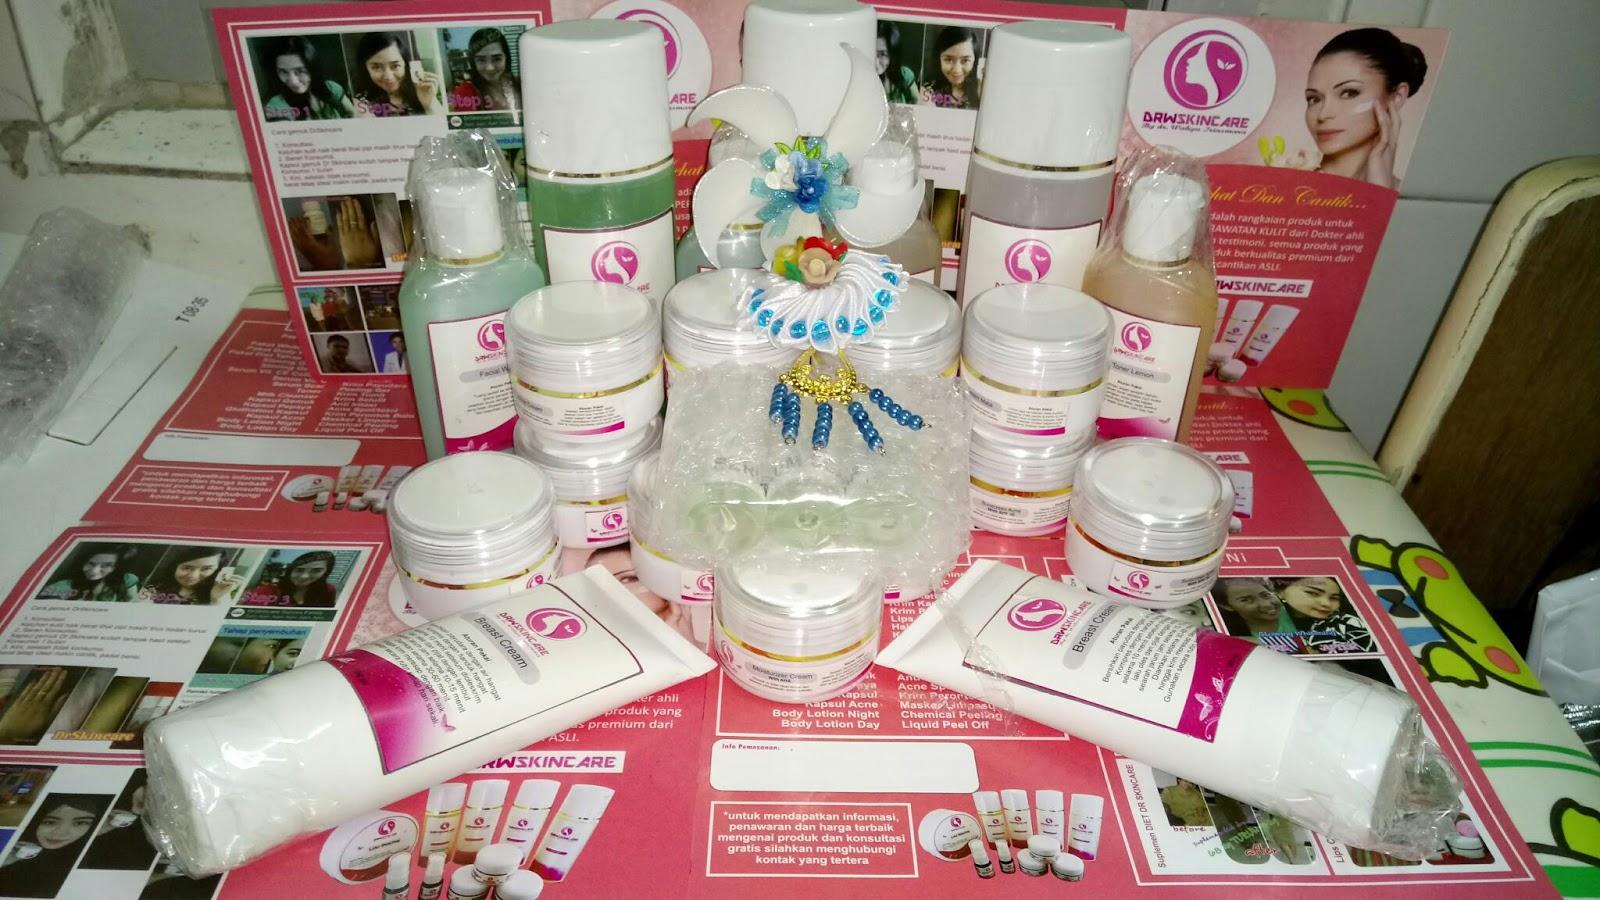 Perawatan Drw Skincare Karanganyar Solo Cara Mendapatkan Product Klinikkecantikan Pemutih Sehat Drwskincare Drwskincarepurworejo Drwskincarehongkong Taiwan Singapore